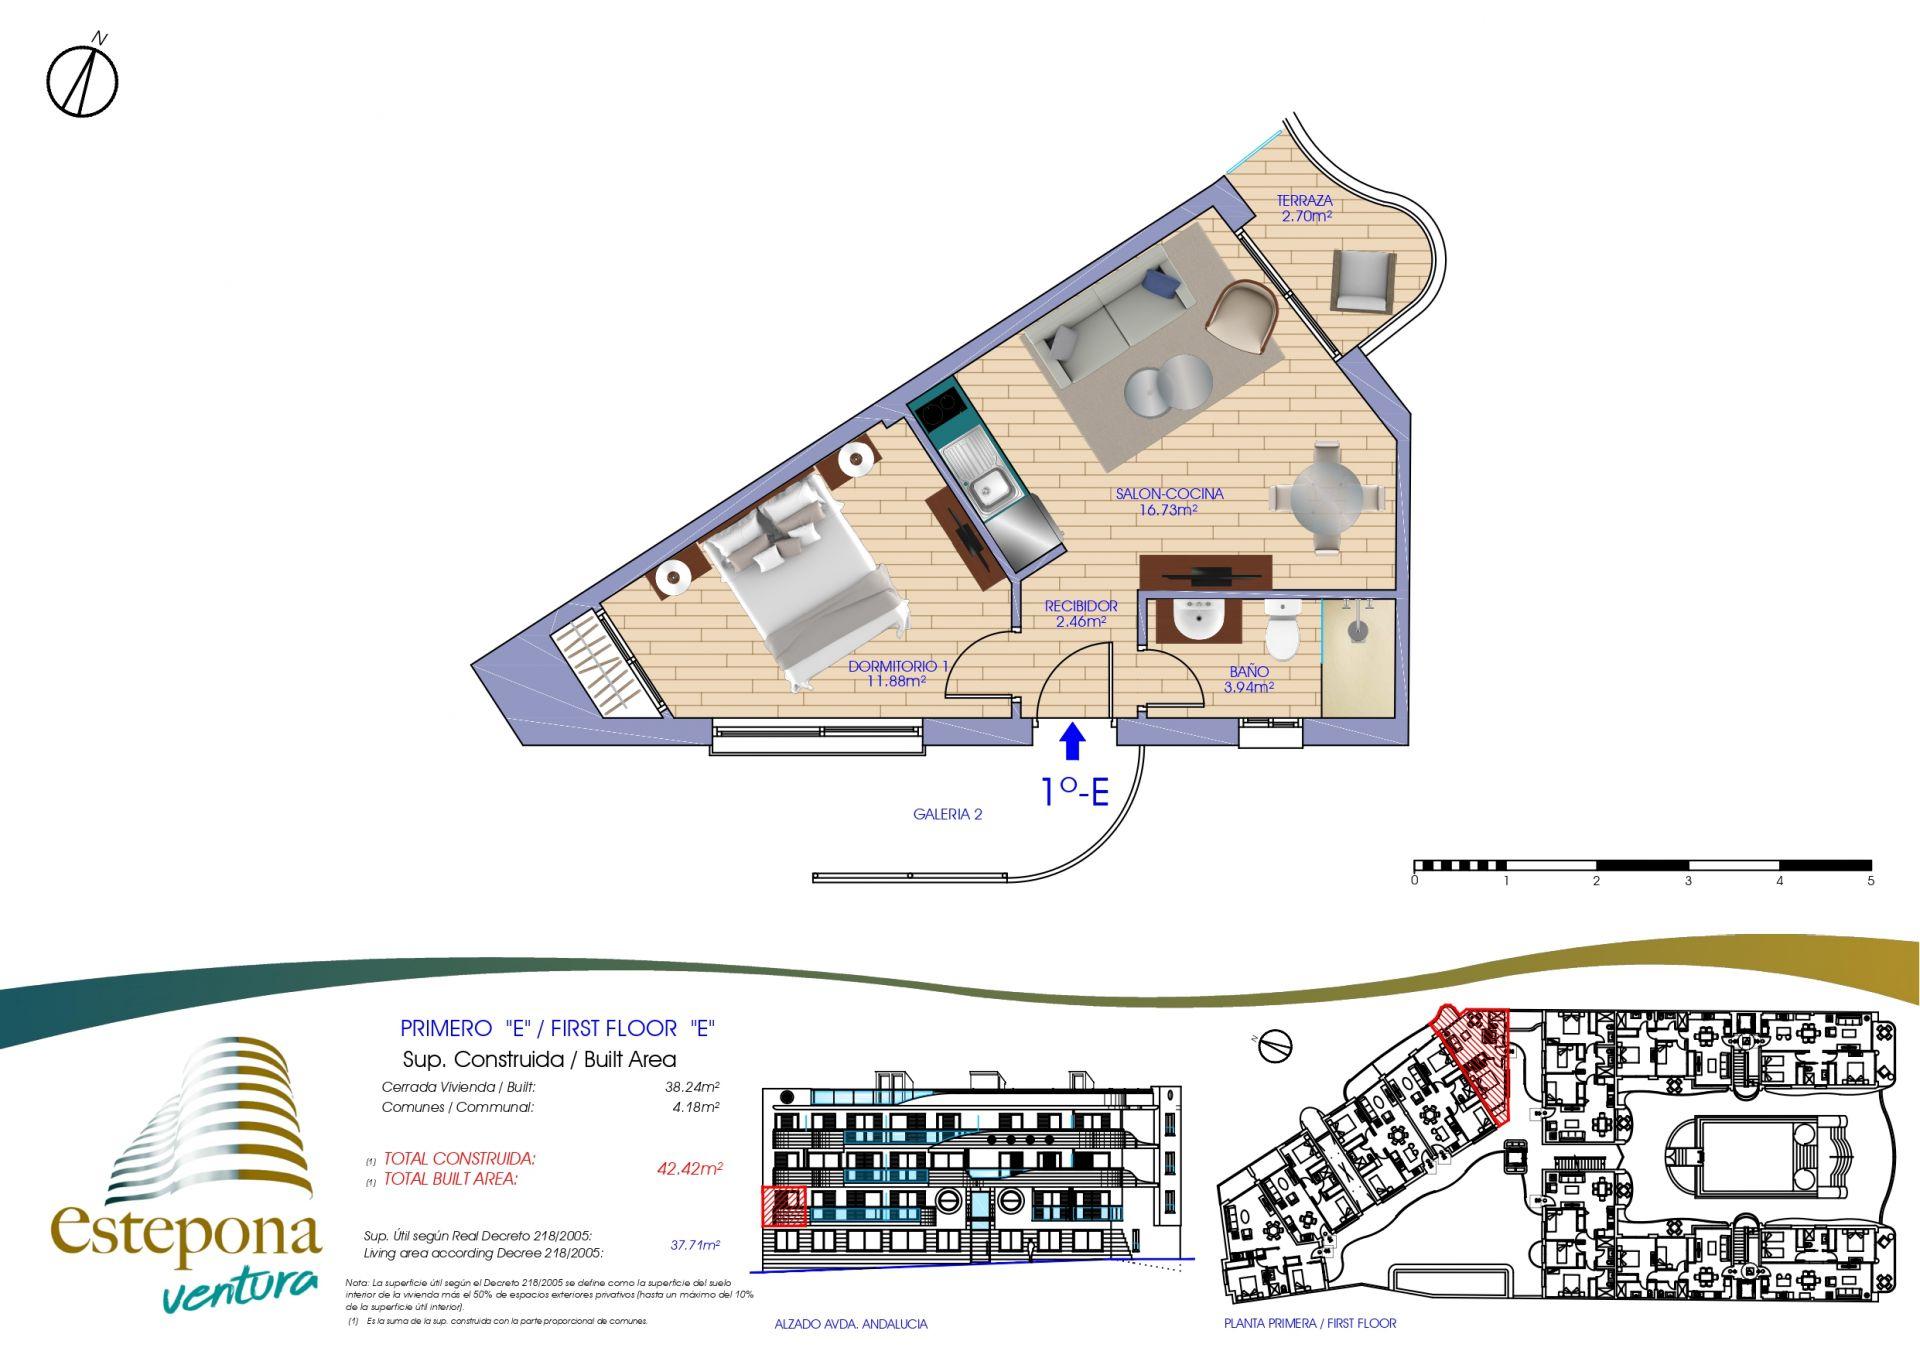 1e - Ventura Estepona | Compra de casa en Estepona